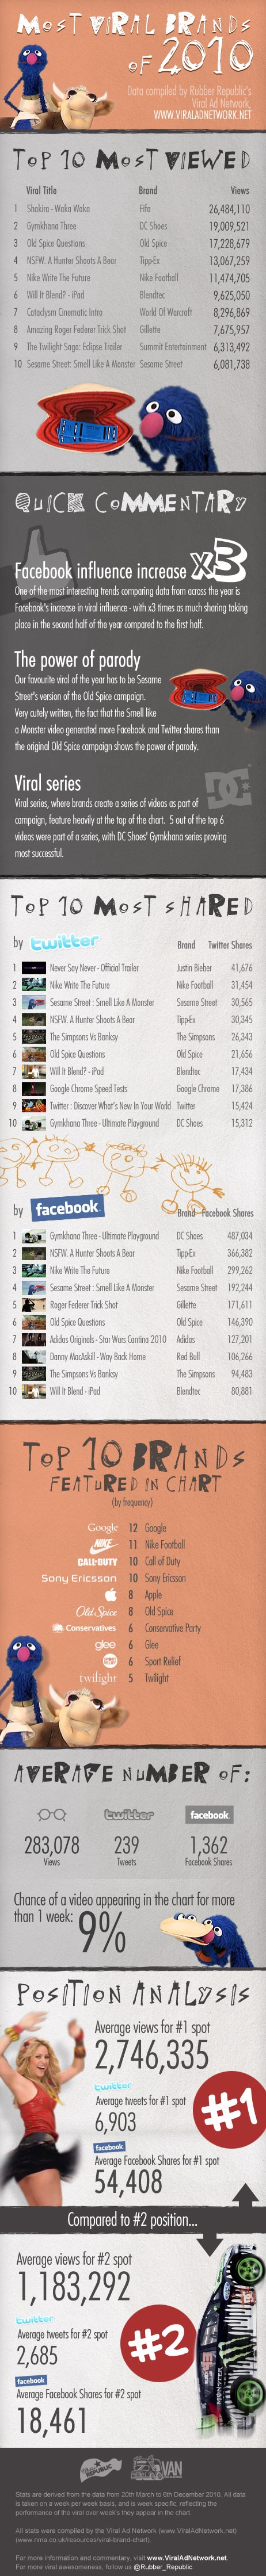 Most Viral Brands